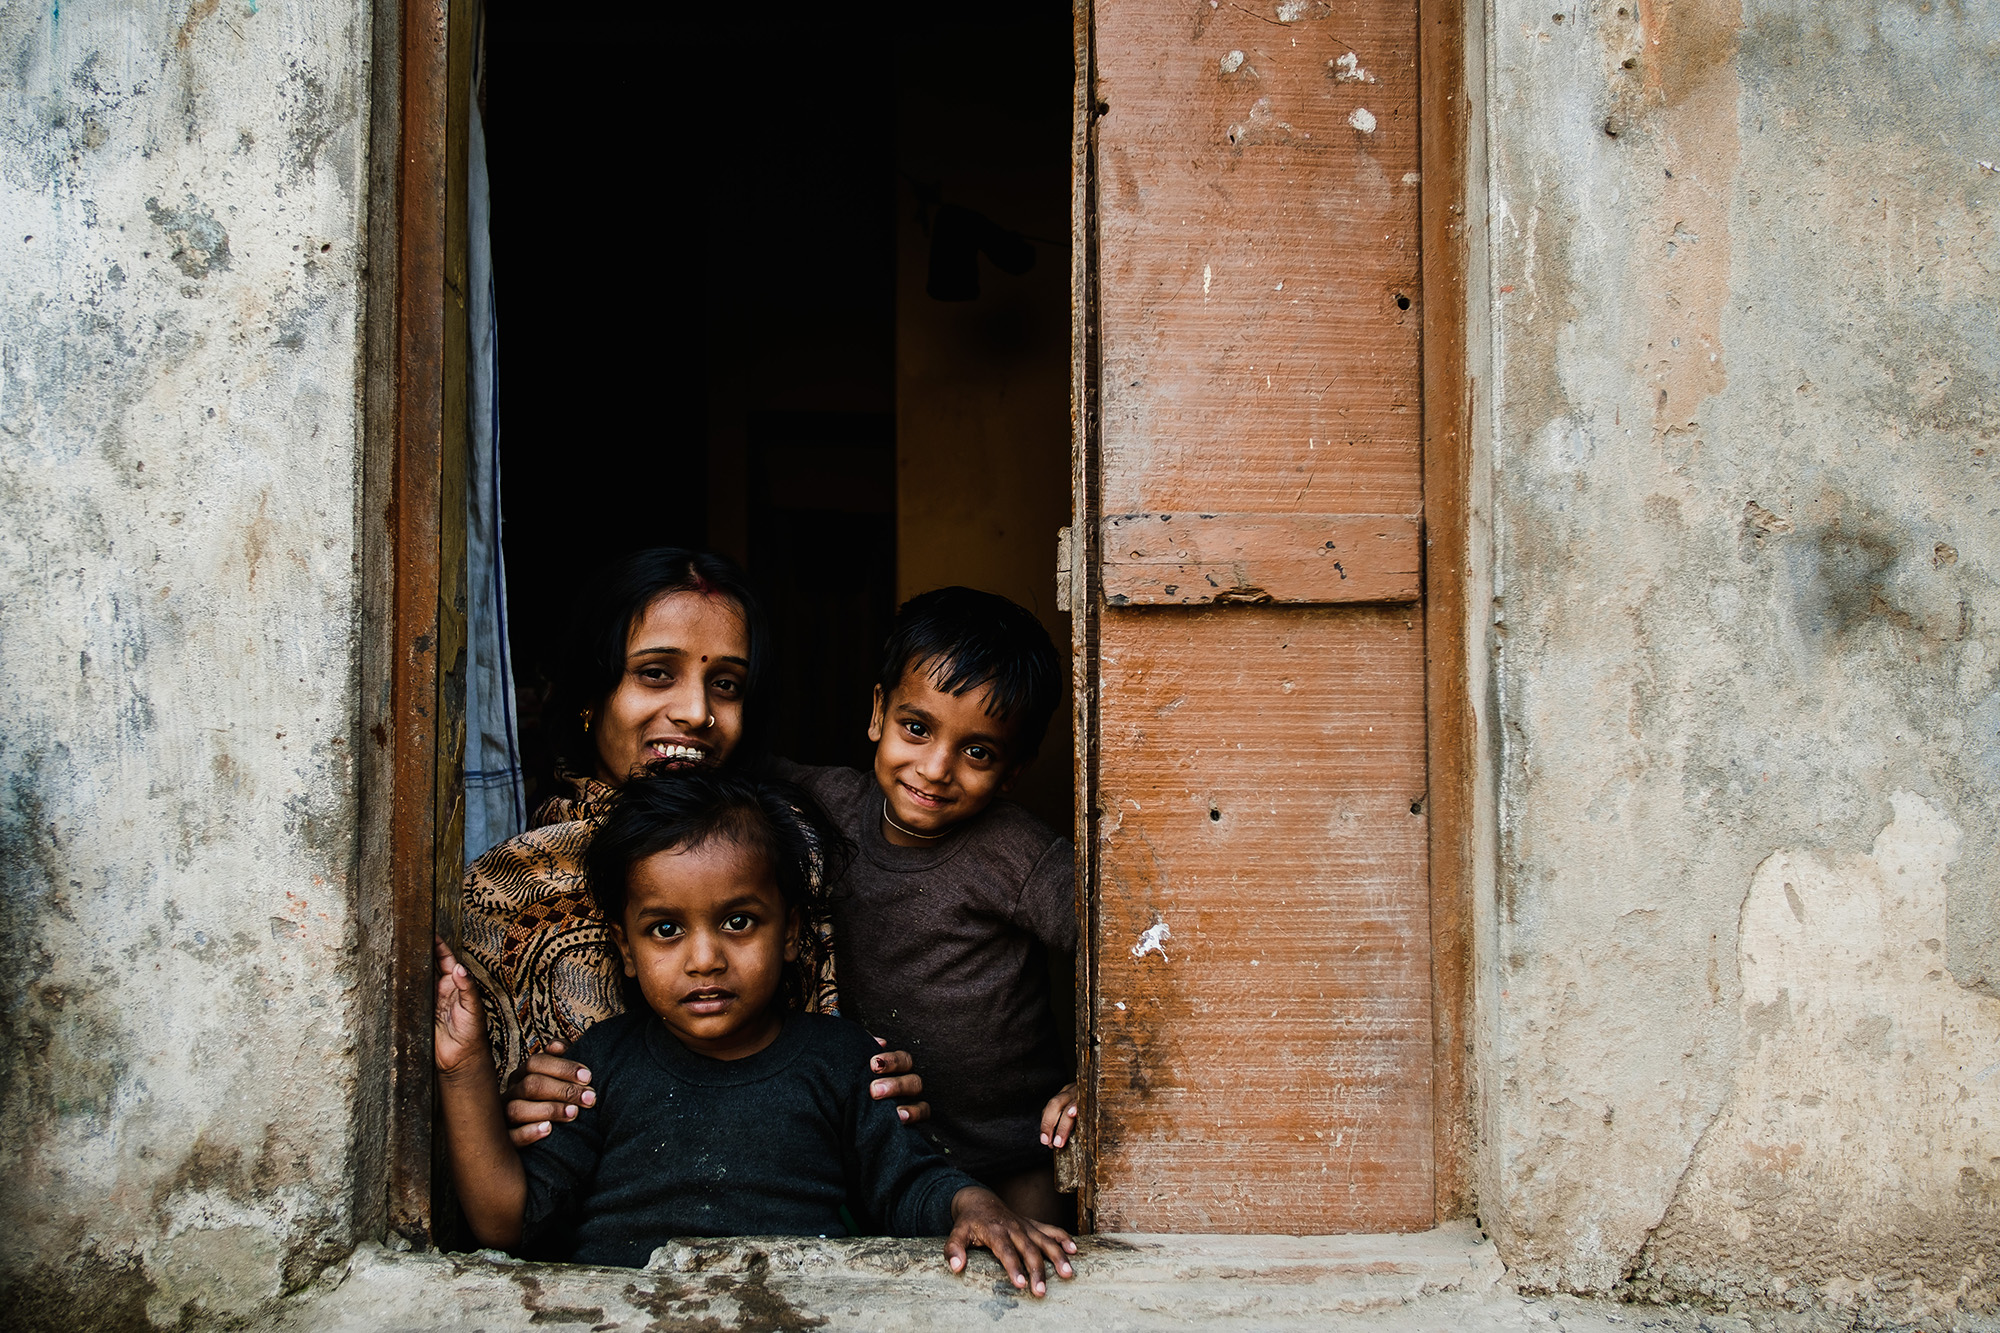 AnjaPoehlmann_India-Varanasi_134.jpg